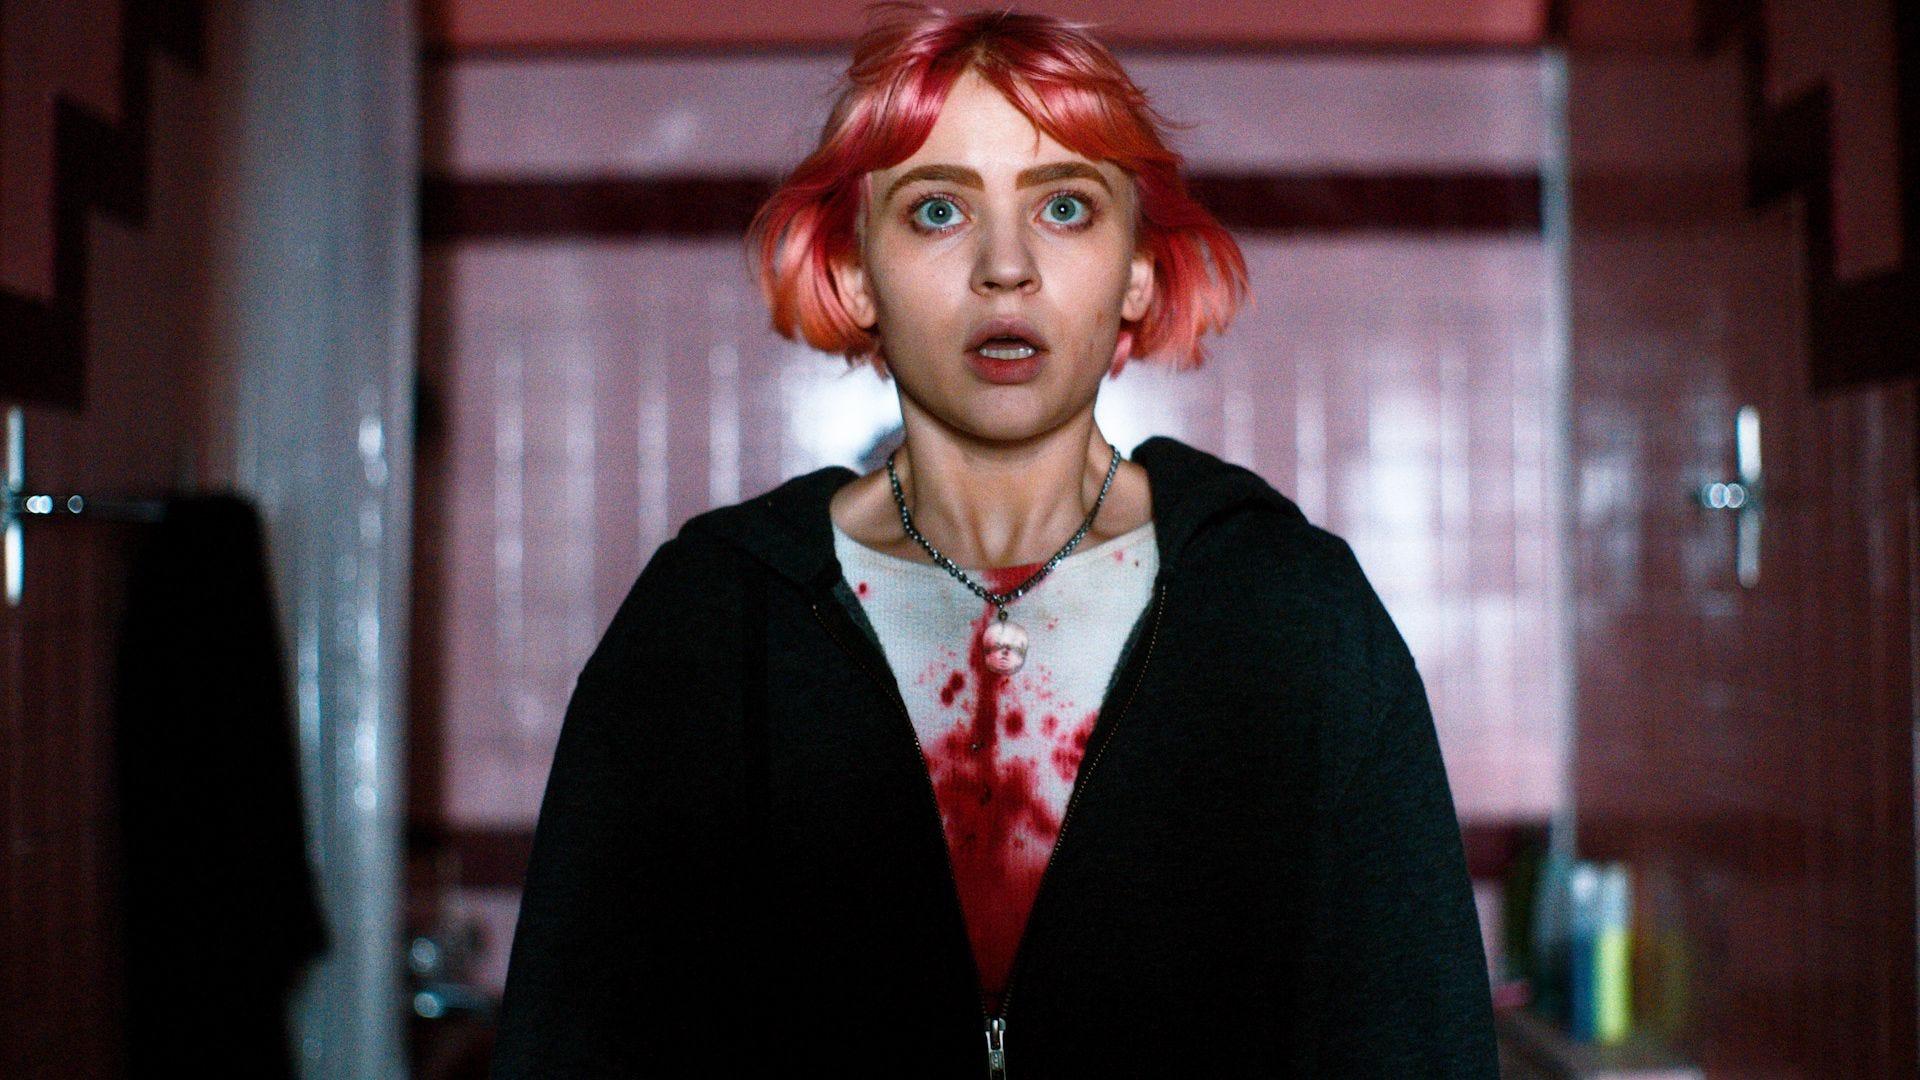 Southfield-made horror movie filmed in just 17 days feels a lot like COVID-19 quarantine